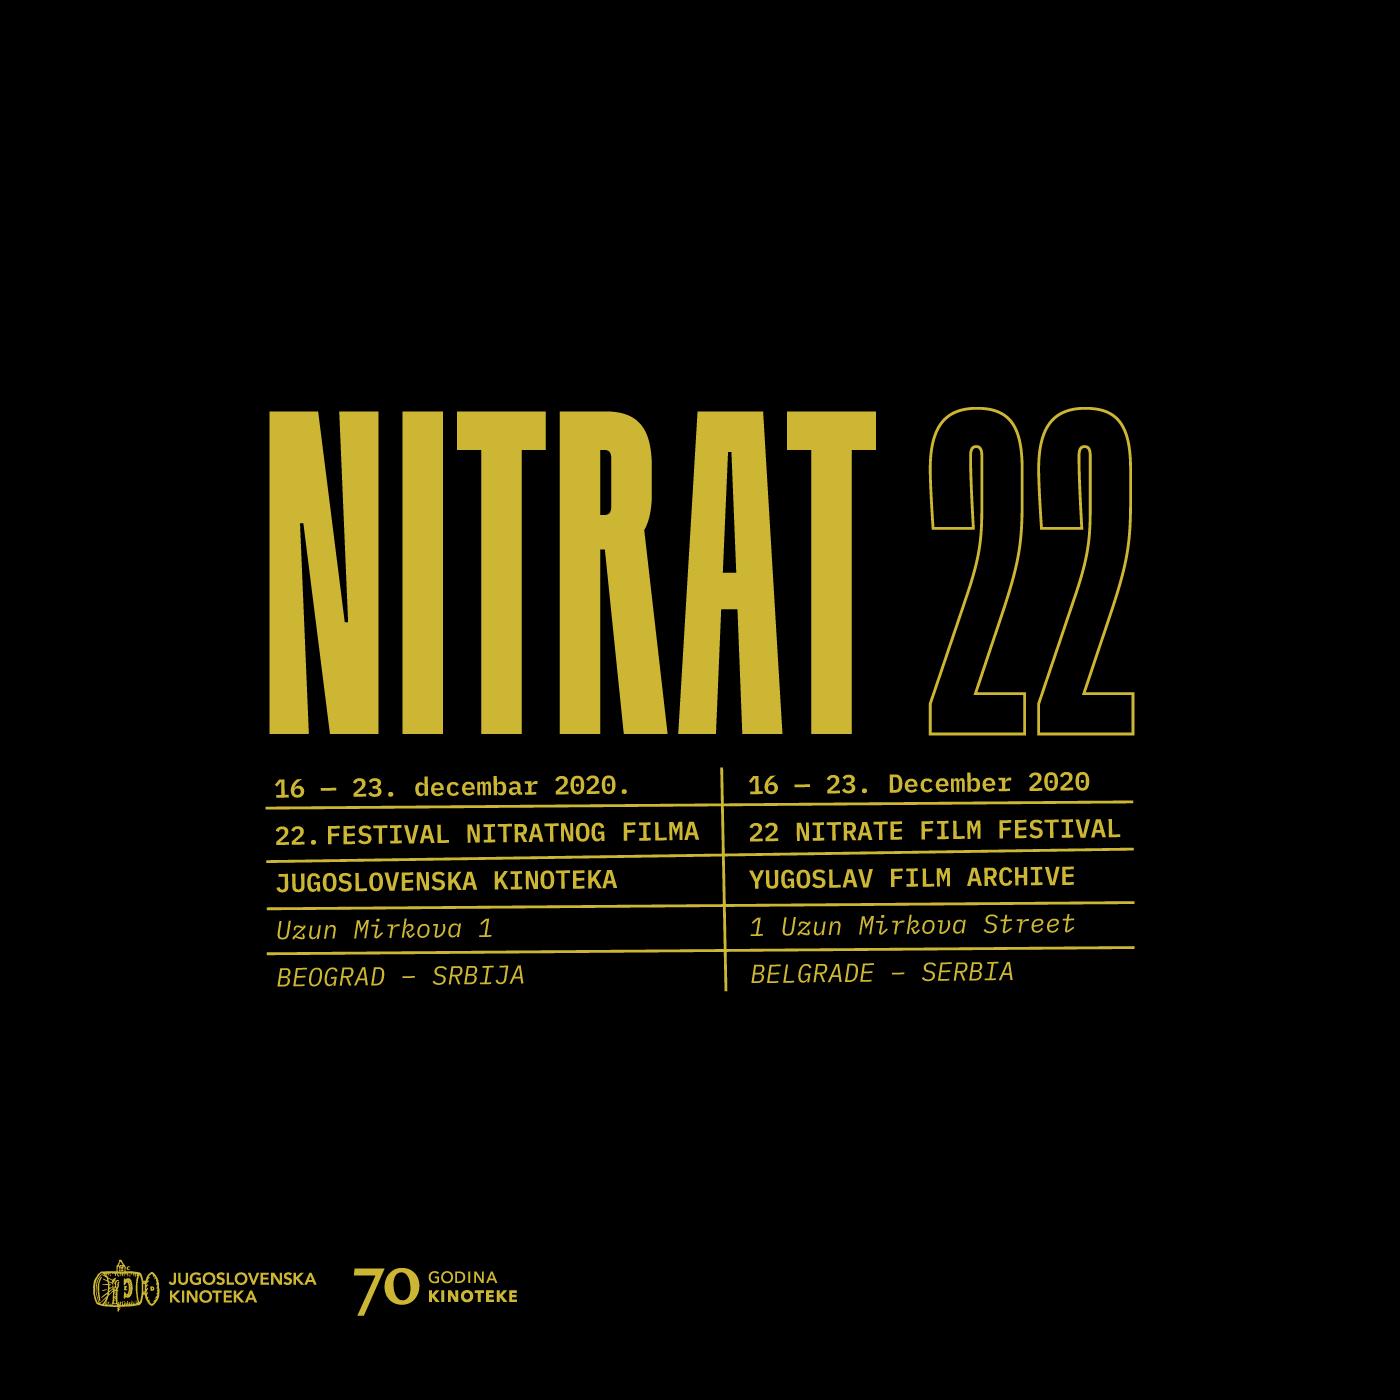 XXII-NITRATNI-FESTVIVAL,-insta-post-03